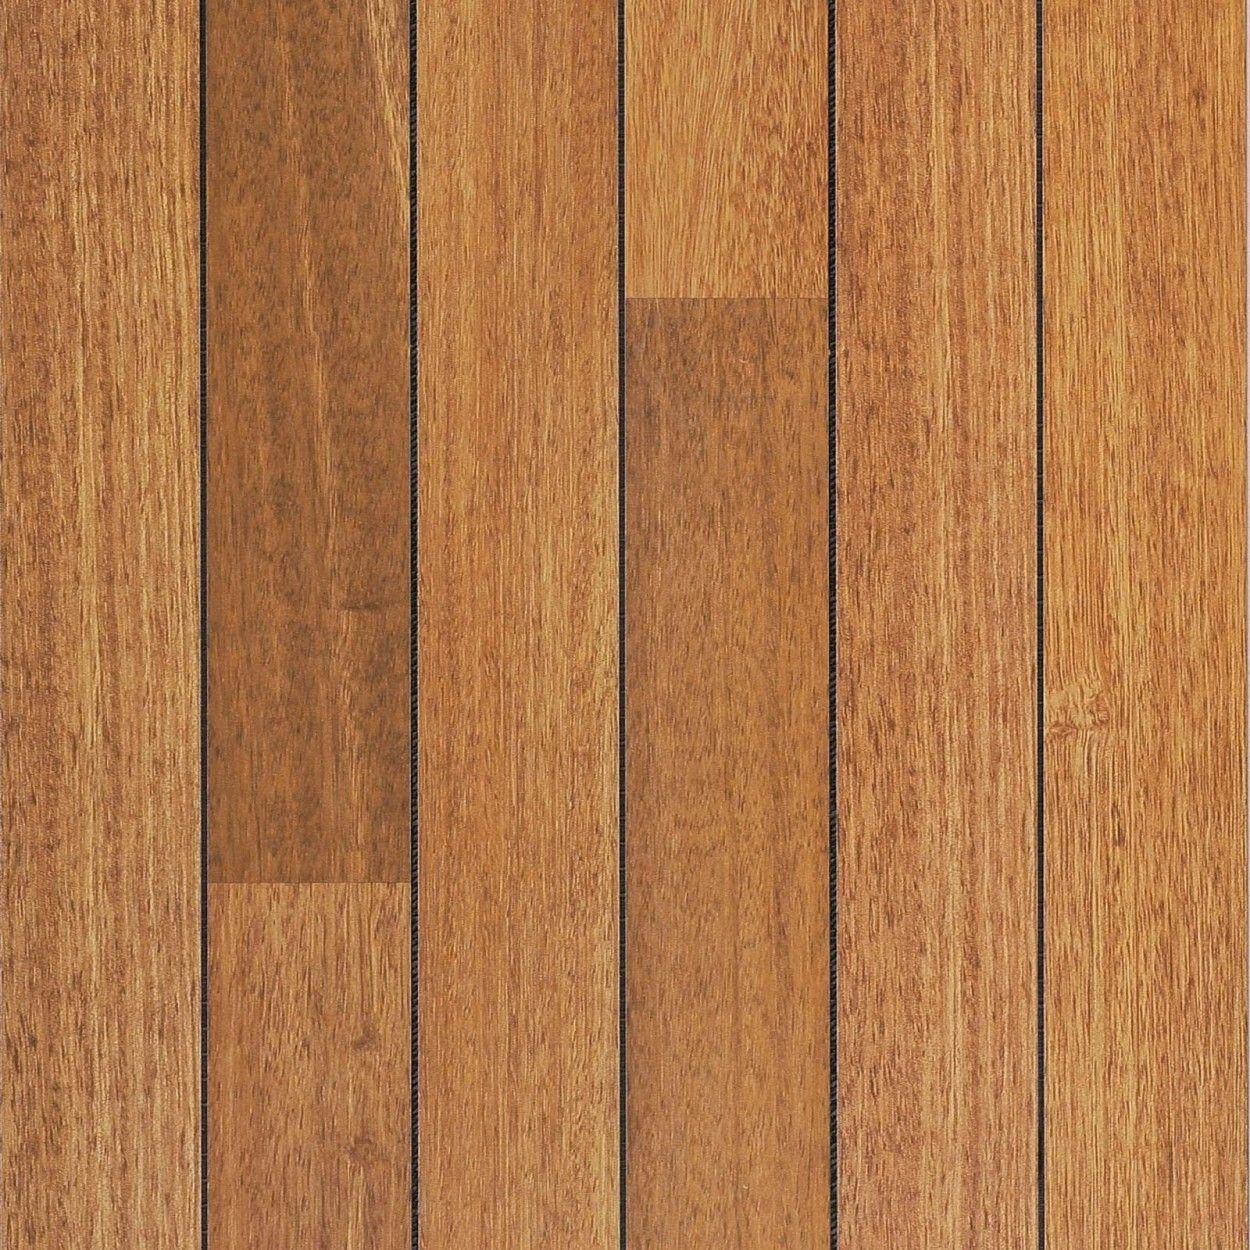 Berryalloc Original Hpl 62001393 Oiled Teak Shipdeck 2 Str Buy Laminate Flooring En 2020 Plancher Teck Stratifie